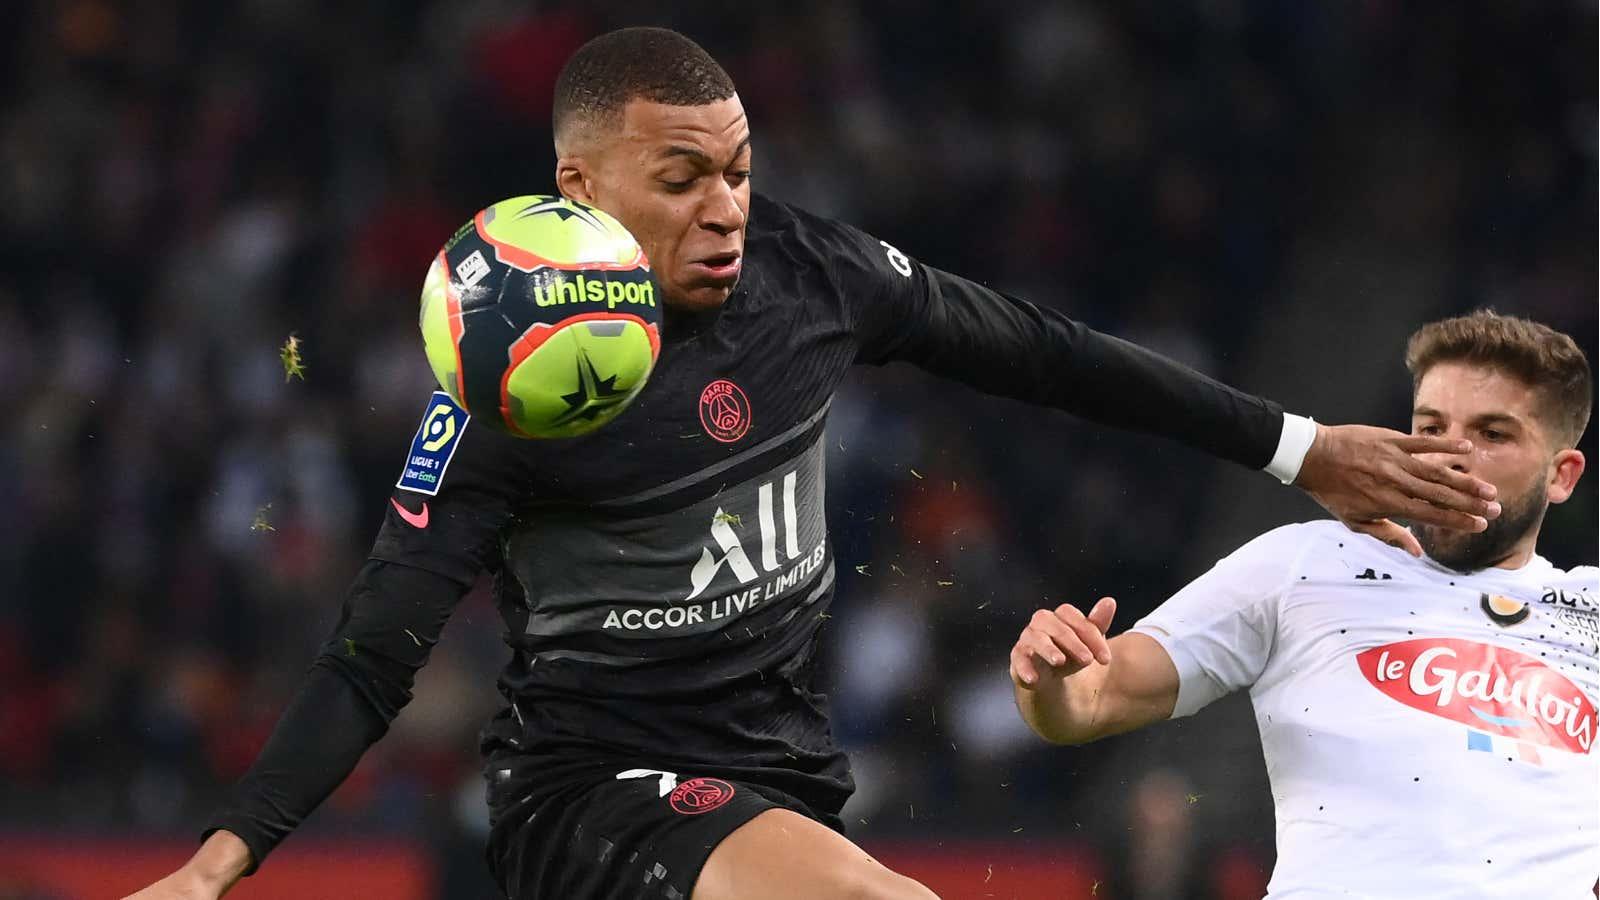 Paris Saint-Germain vs. SCO Angers Live-Kommentar und Ergebnis, 15.10.21, Ligue 1 | Goal.com